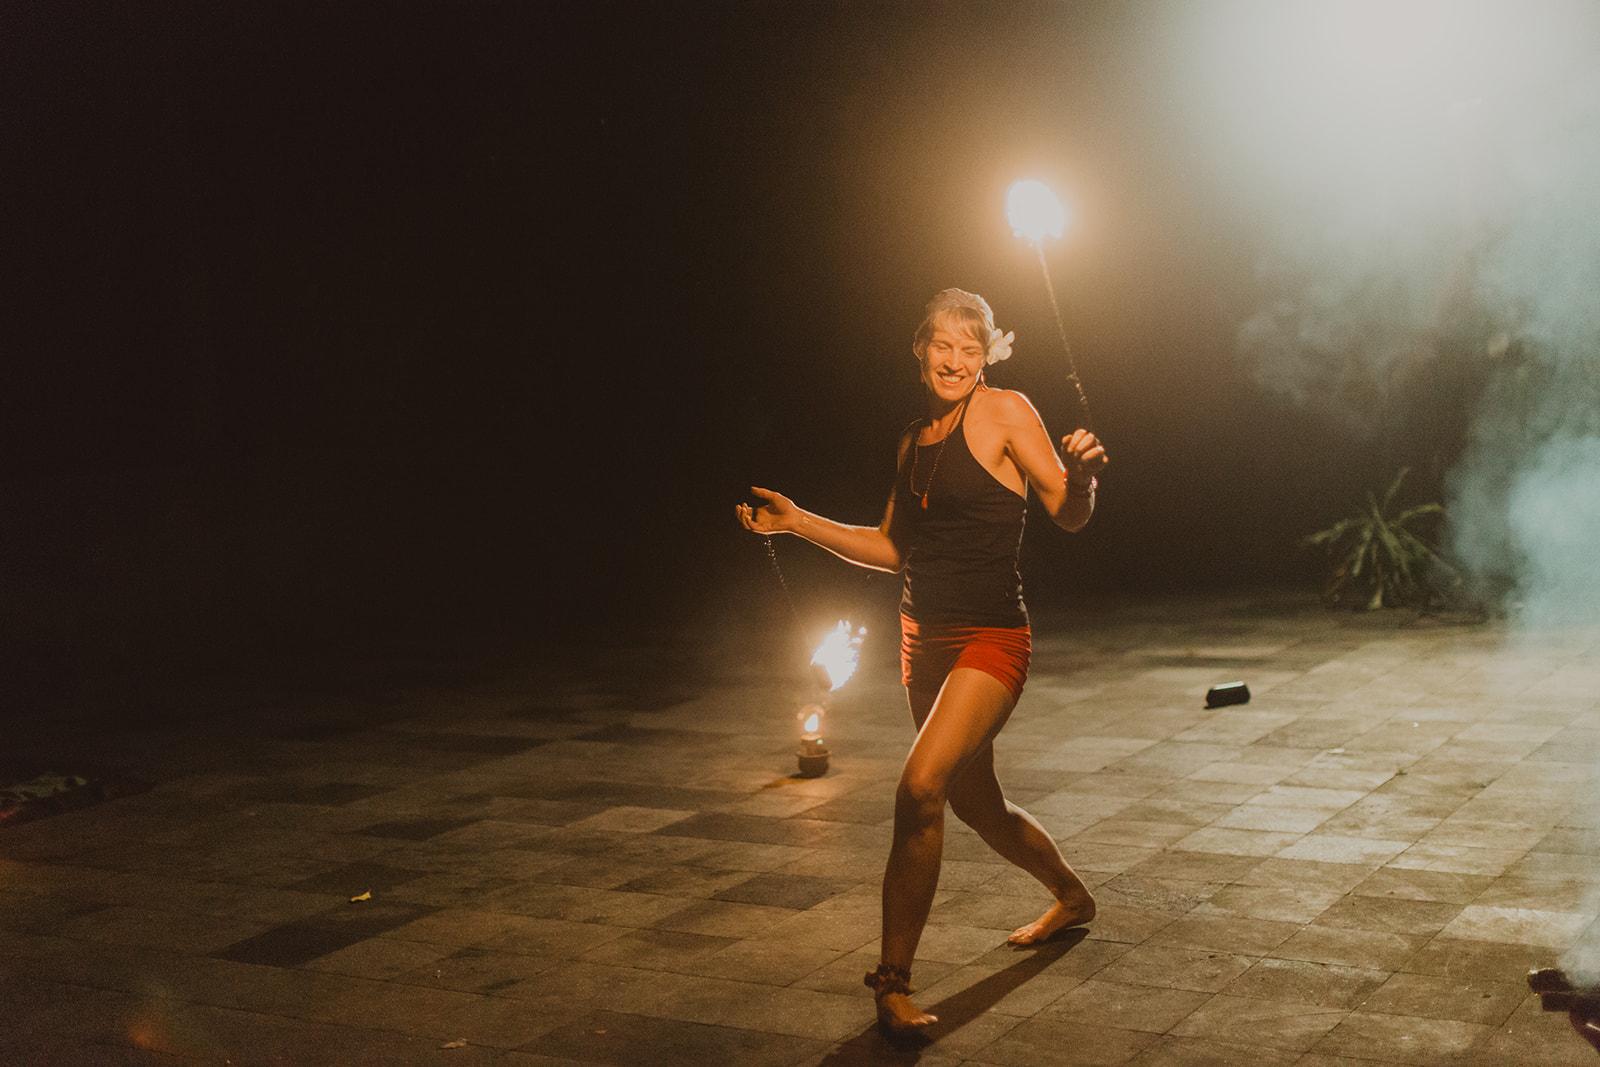 BTT Bali 2019 - Fire Expression Night